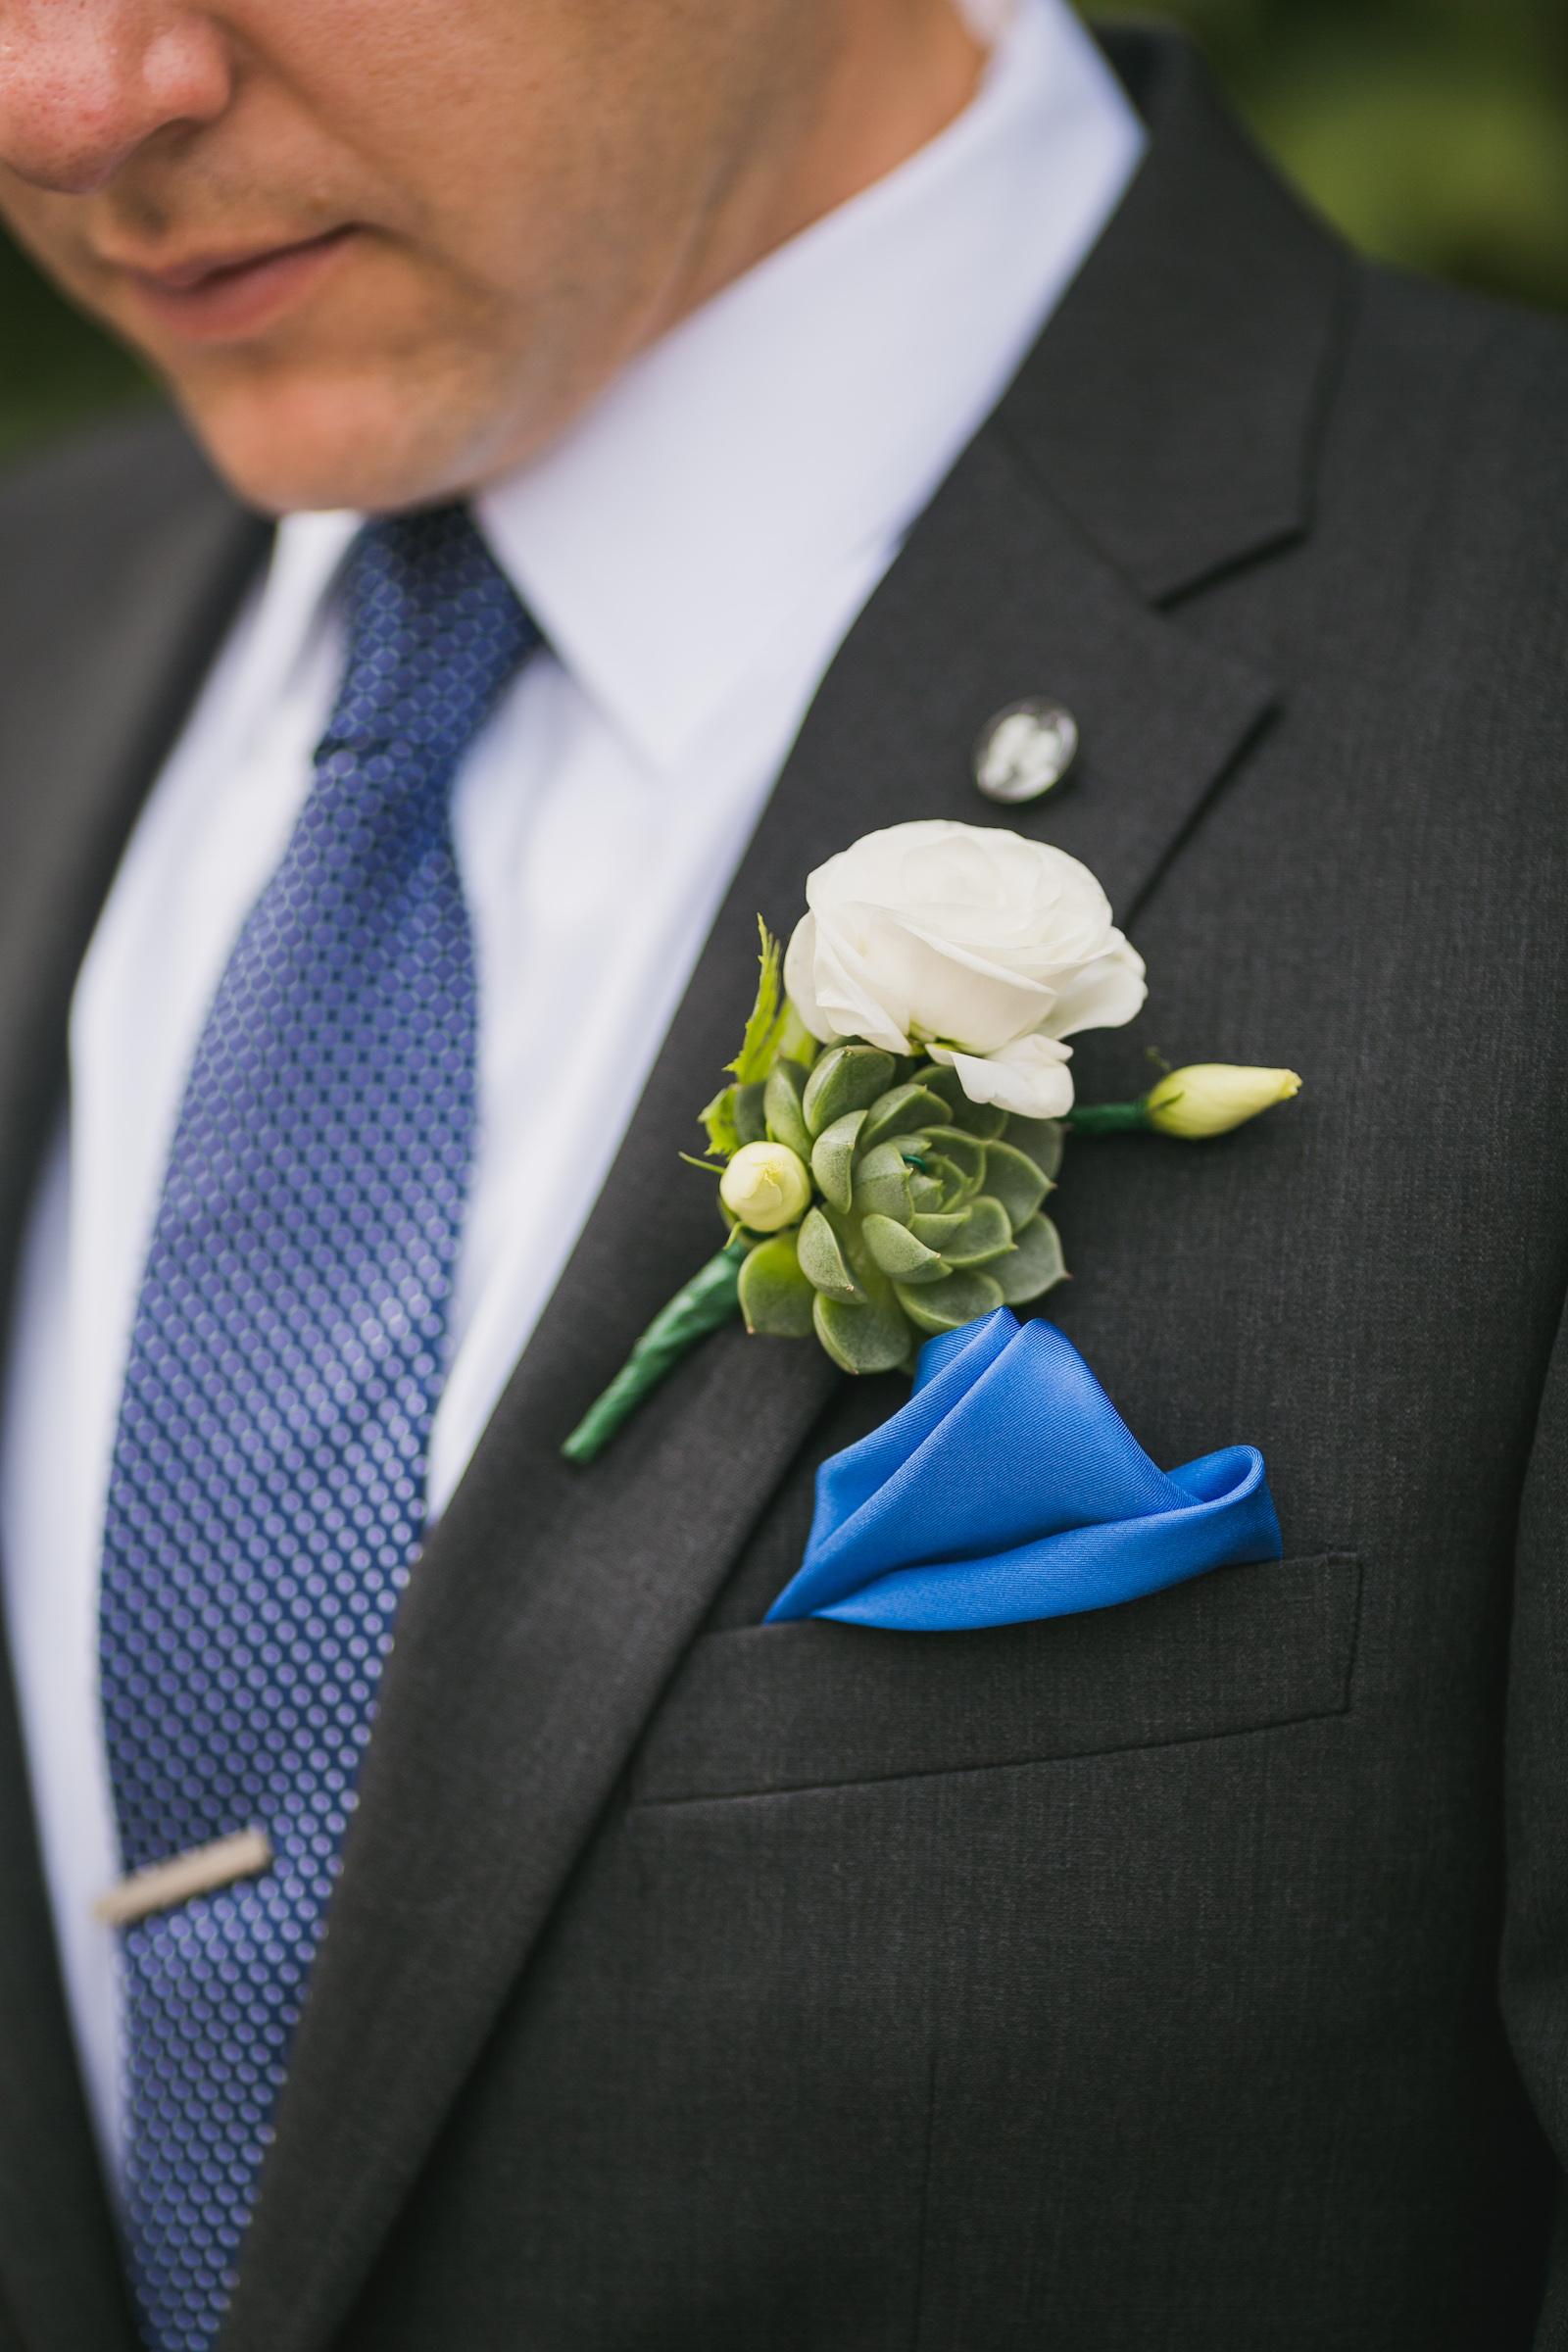 wisconsin-wedding-acowsay-uttke-photography-33.jpg